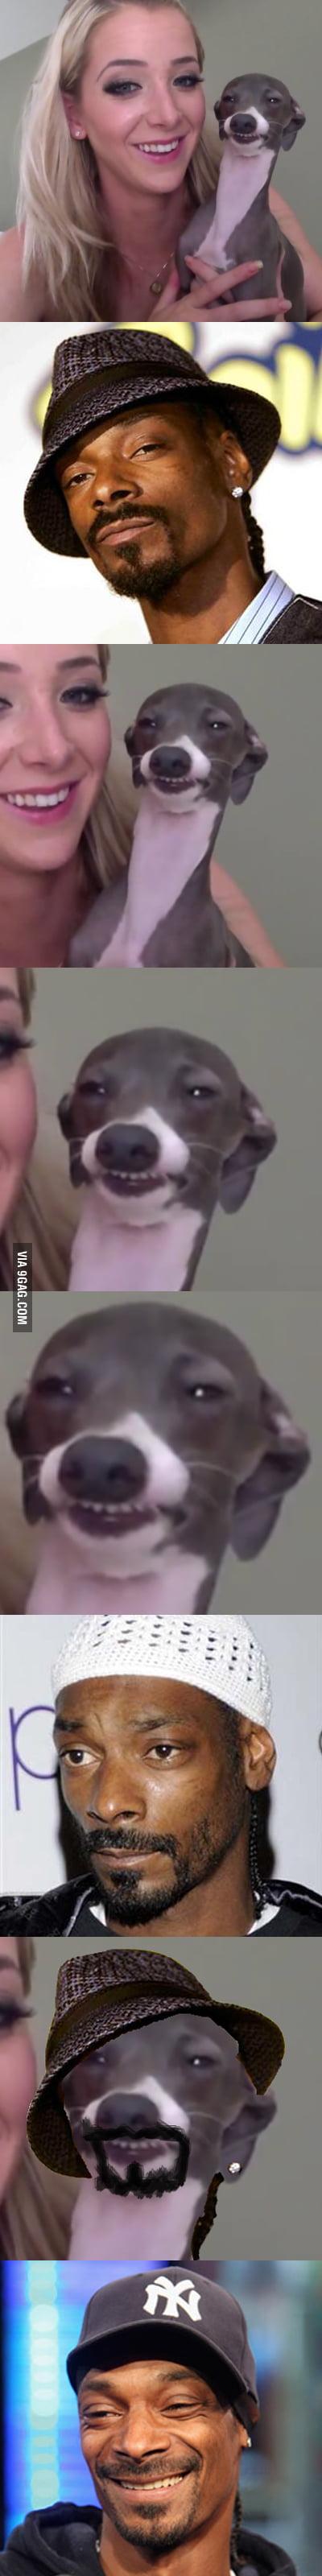 Just Snoop's Dogg